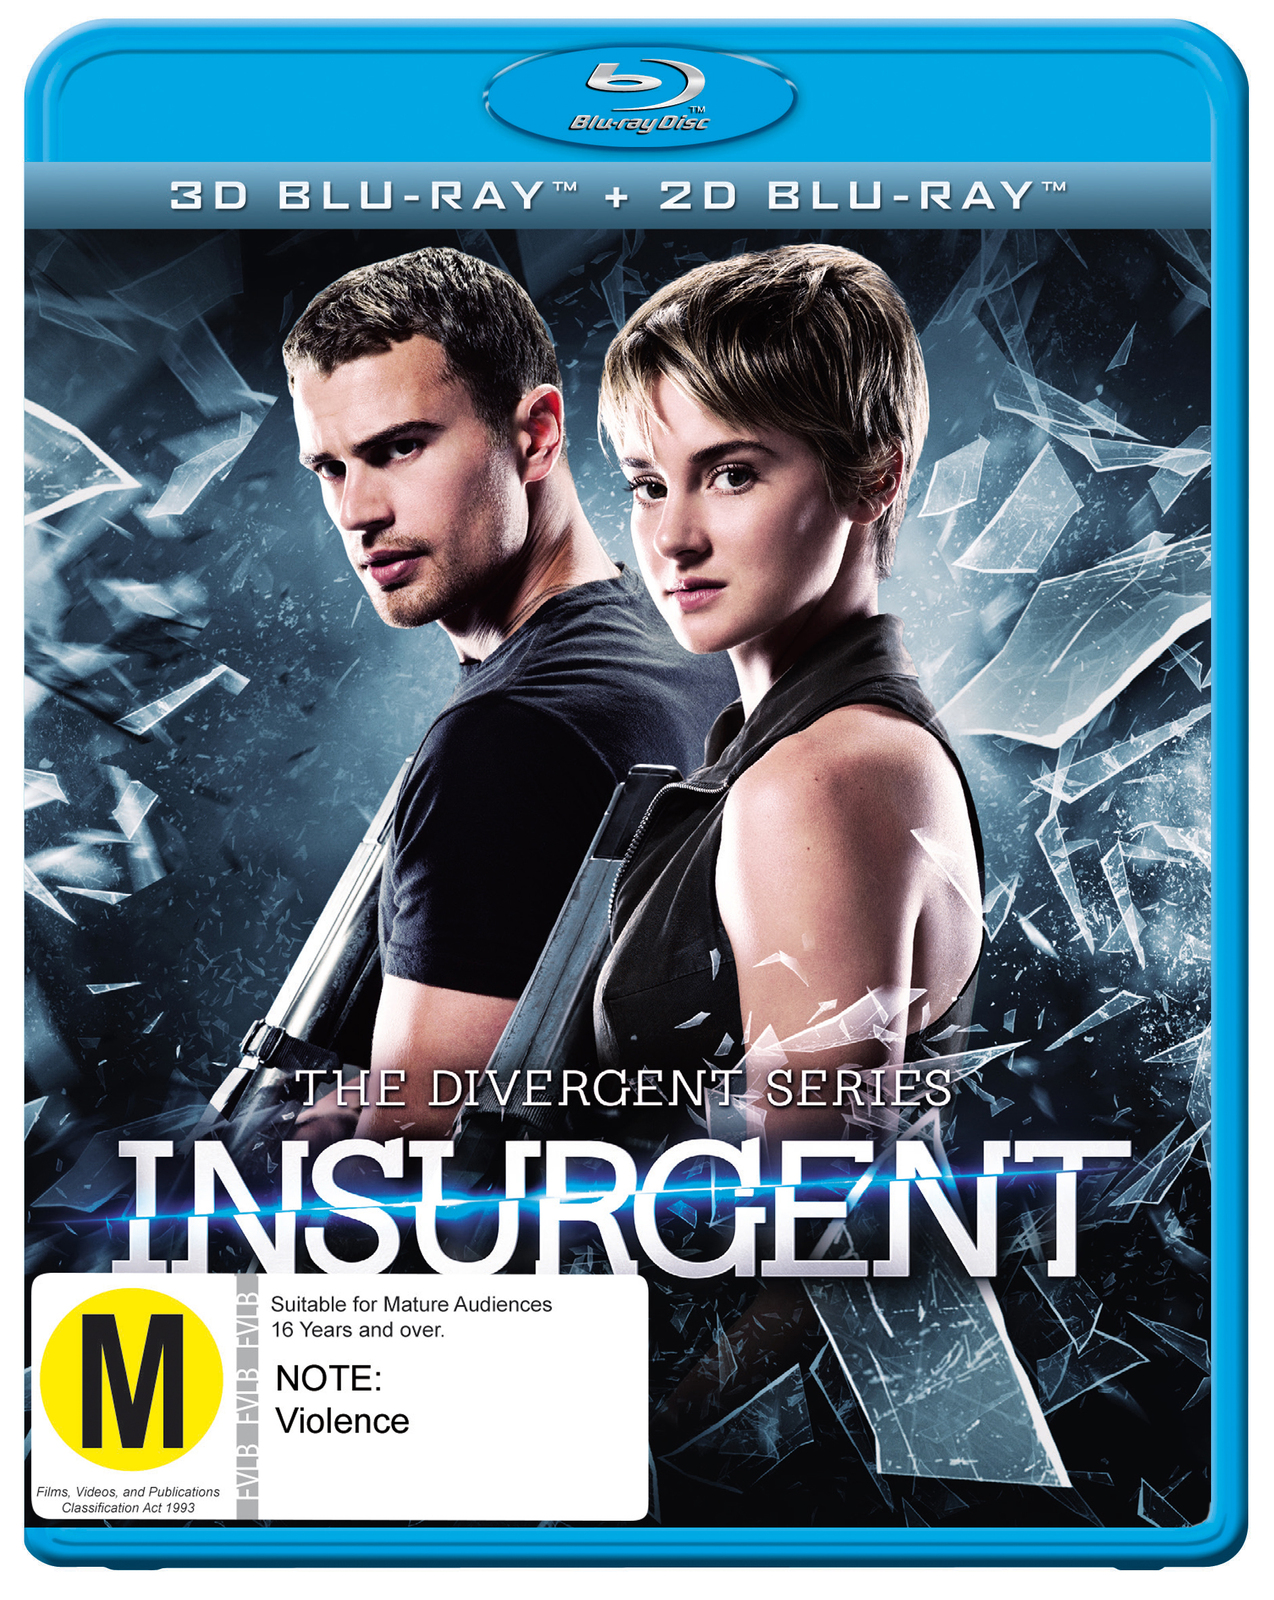 Insurgent on Blu-ray, 3D Blu-ray image